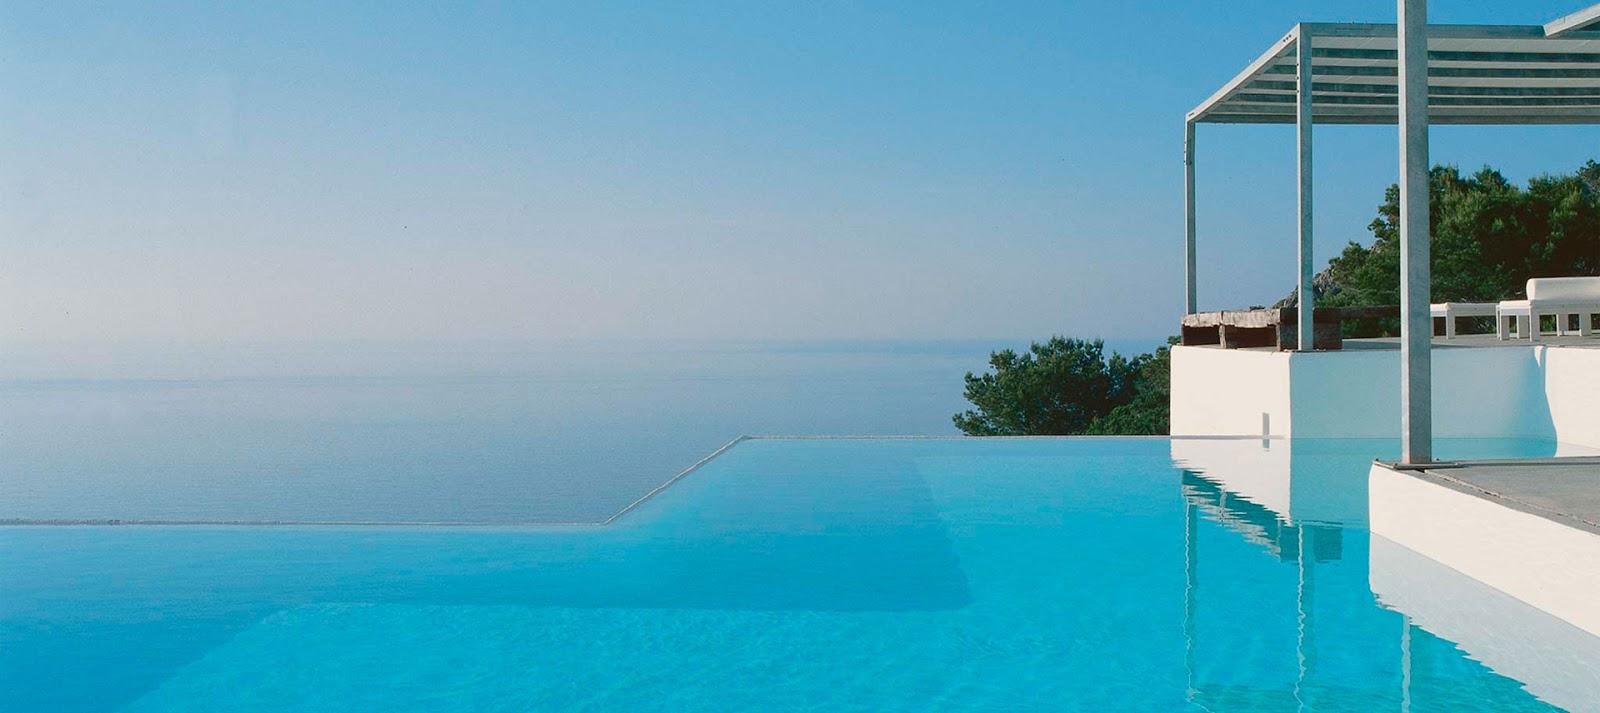 simplicity love: Na Xemena House, Ibiza, Spain | Ramon Esteve